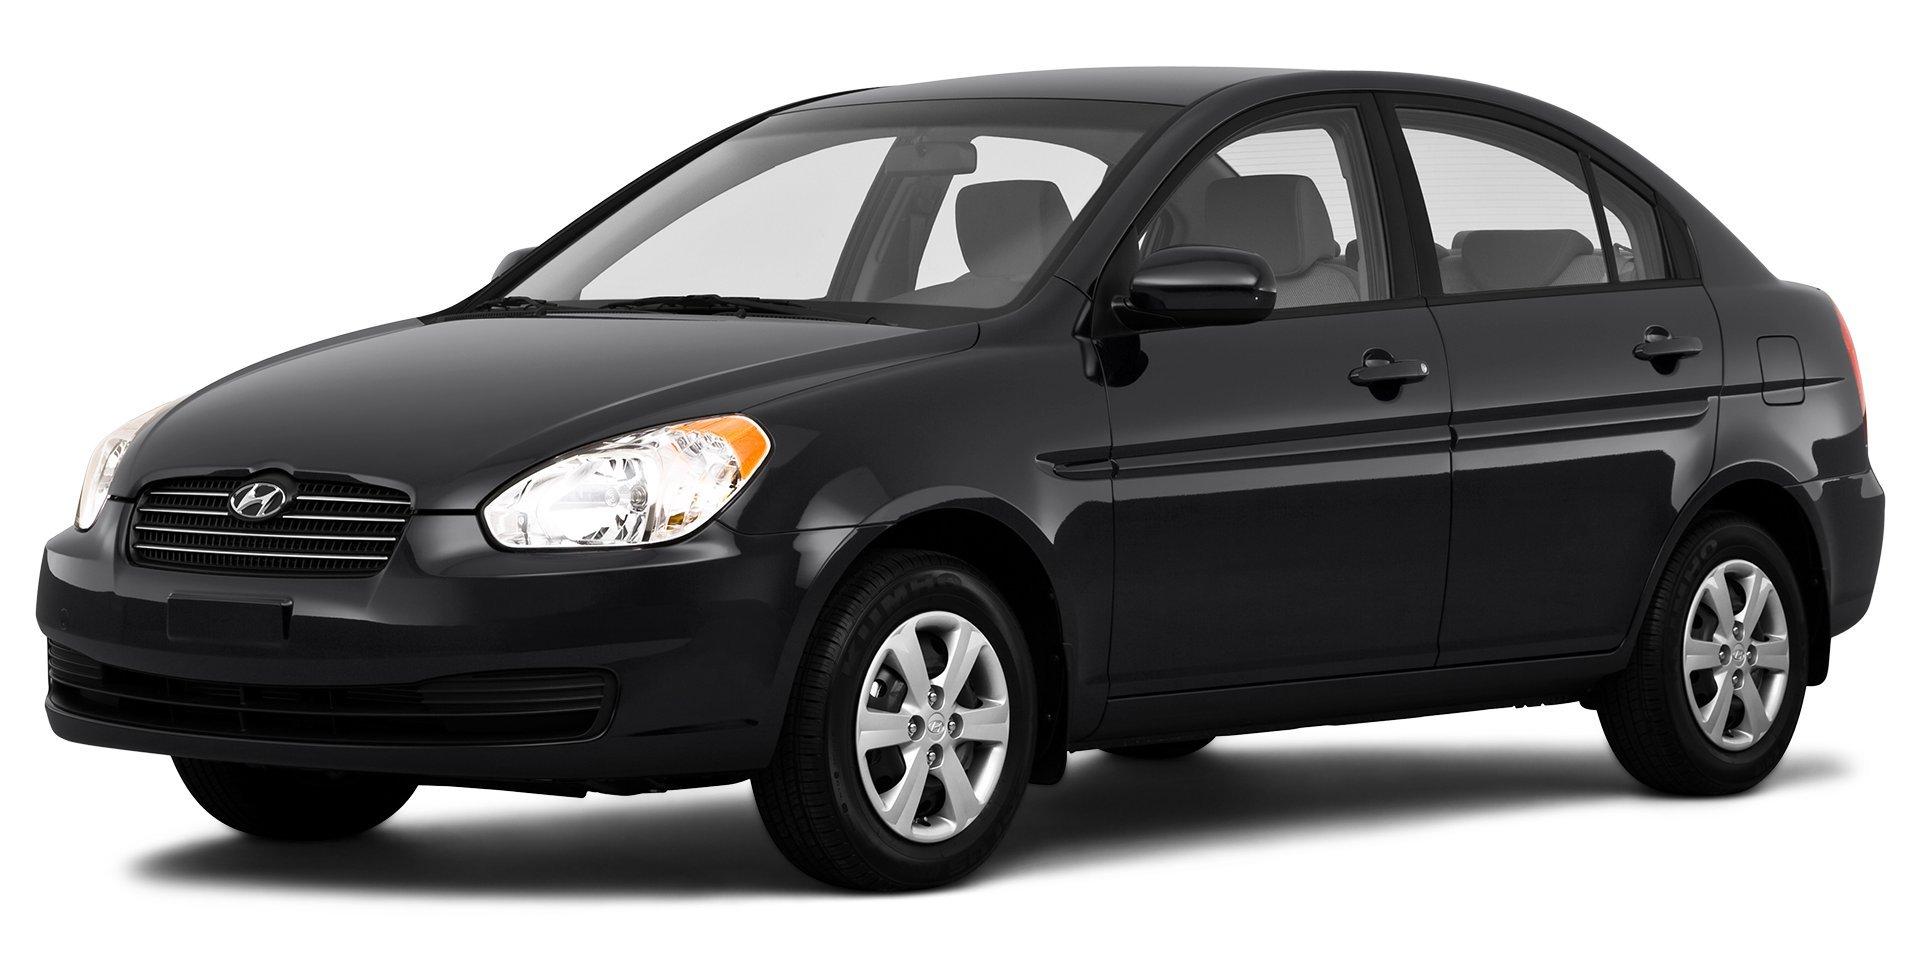 ... 2010 Hyundai Accent GLS, 4-Door Sedan Automatic Transmission. 2010 Nissan  Versa ...